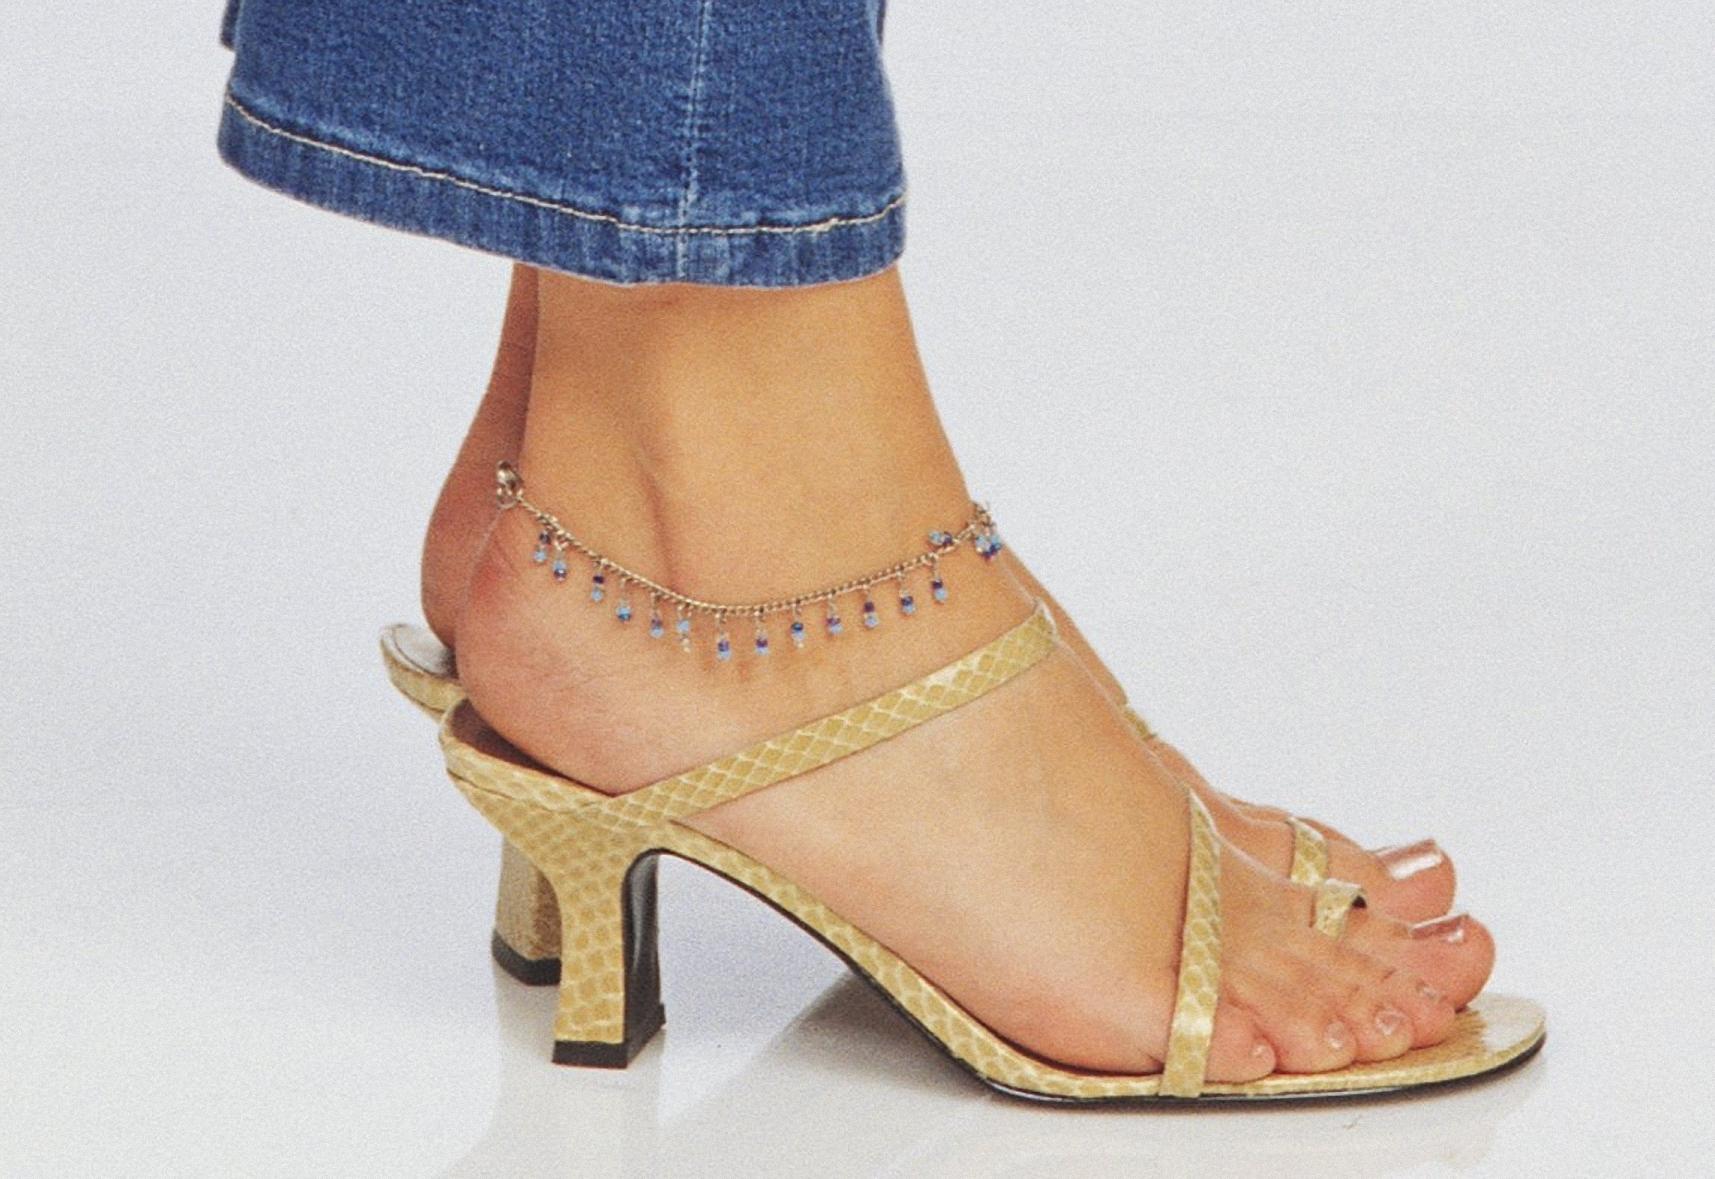 Melissa joan hart feet new style for 2016 2017